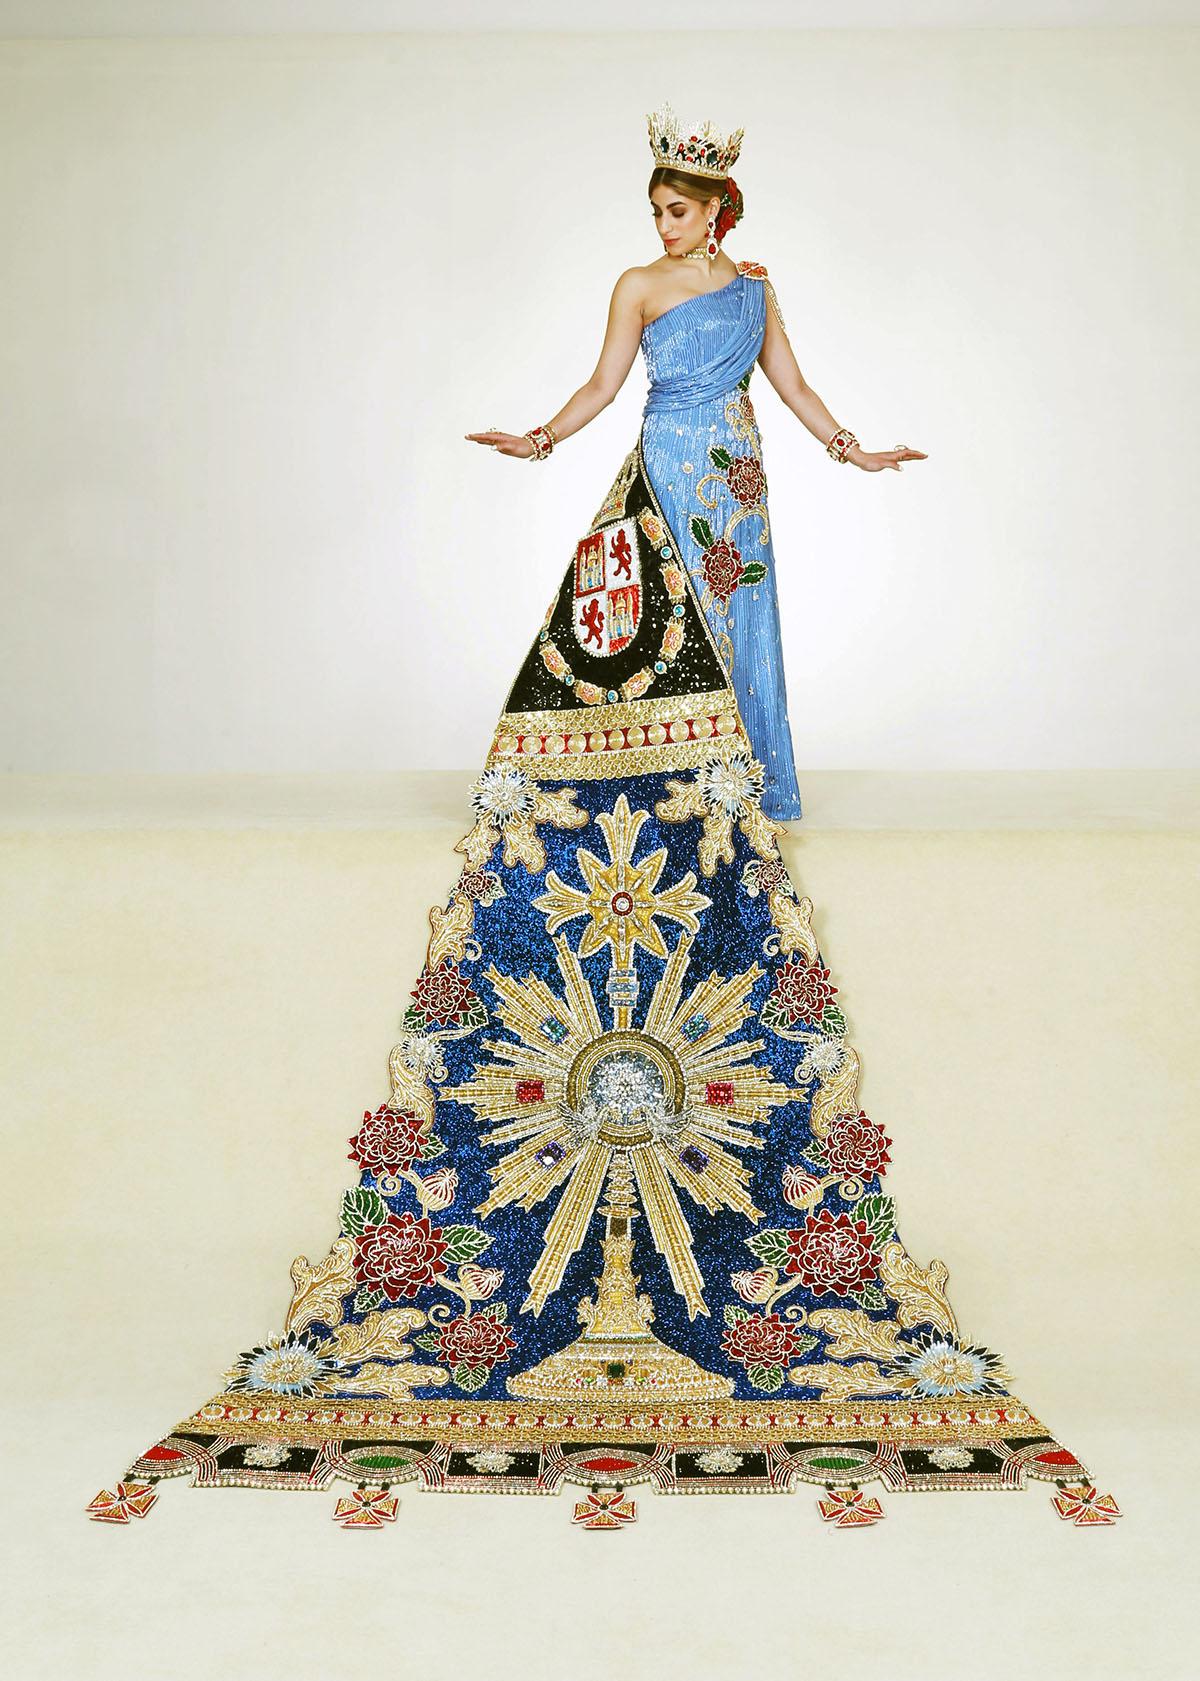 Alegra Volpe, Duchess Of The Splendors Of The New World